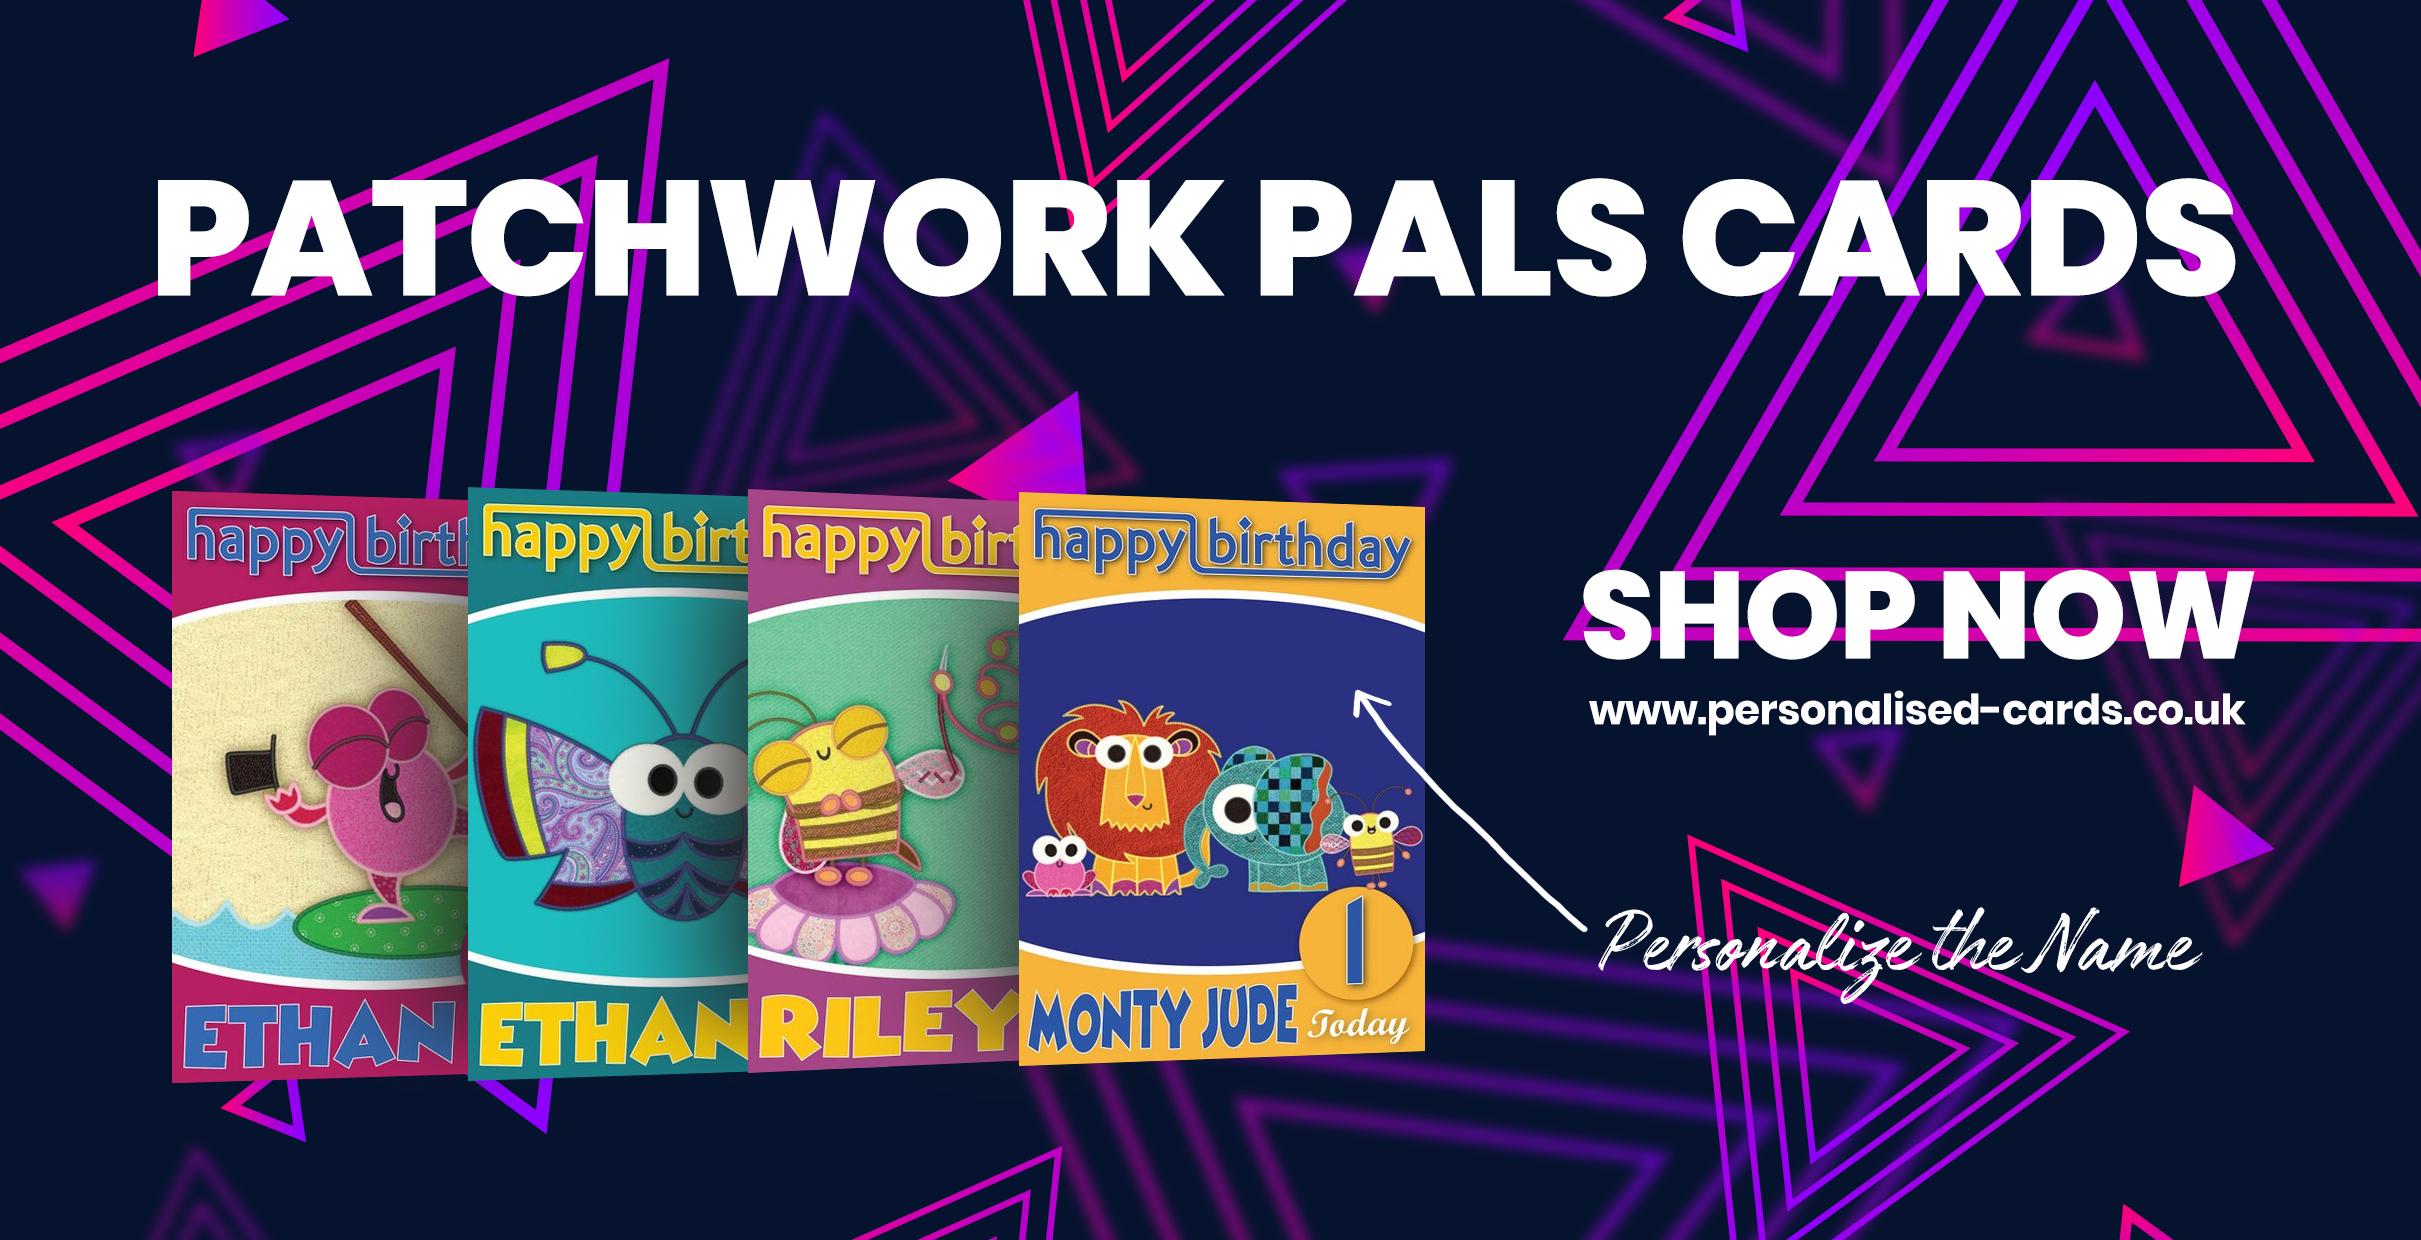 patchwork-pals-cards.jpg